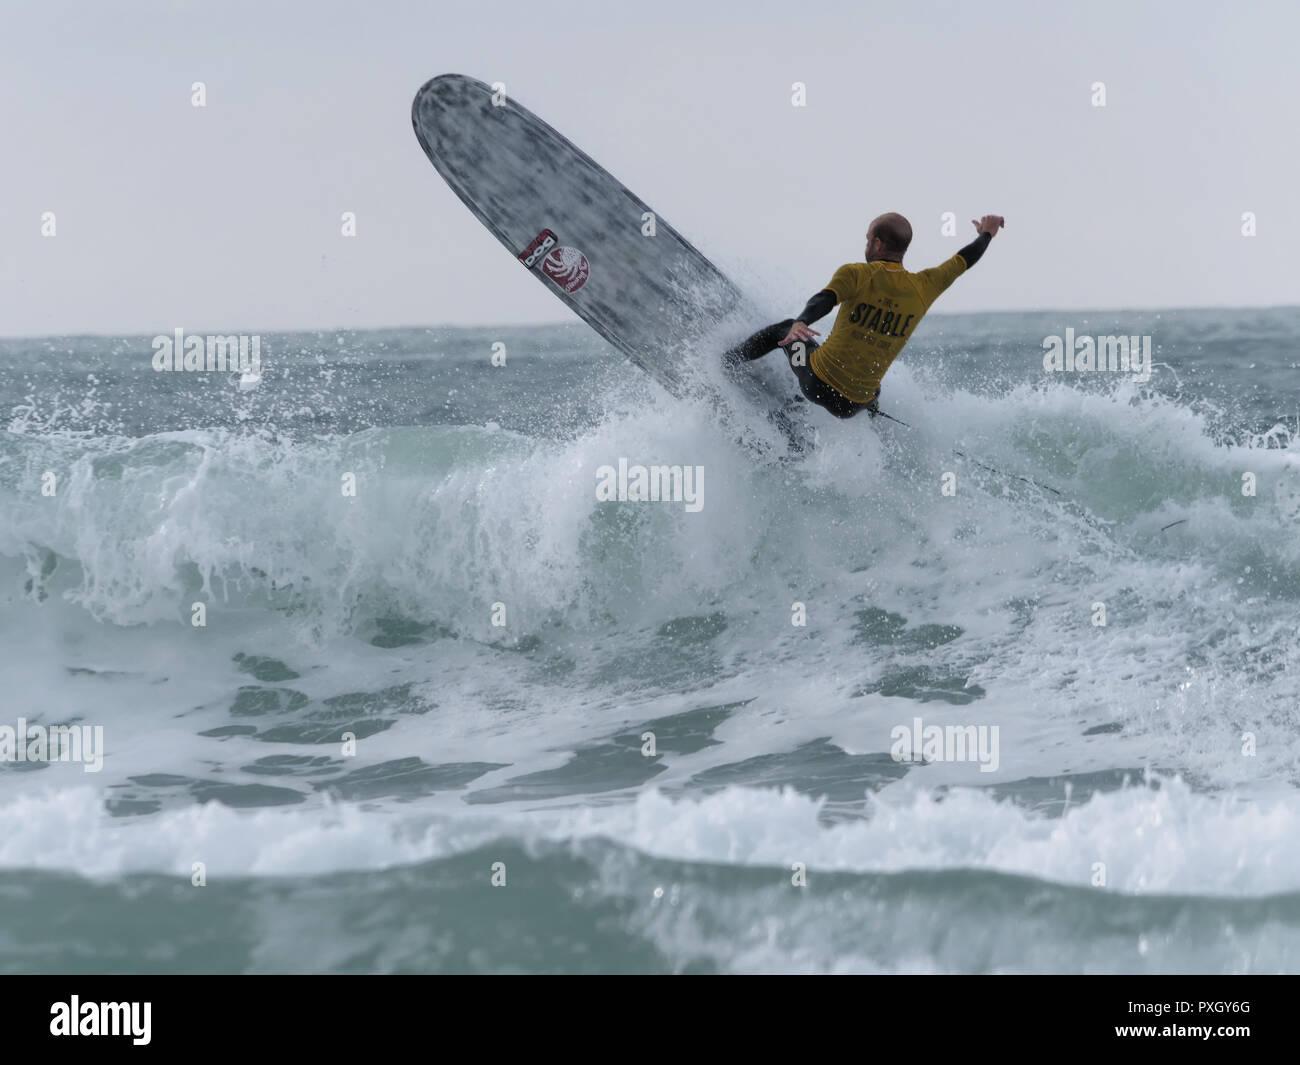 Surfing Longboard Man, UK - Stock Image